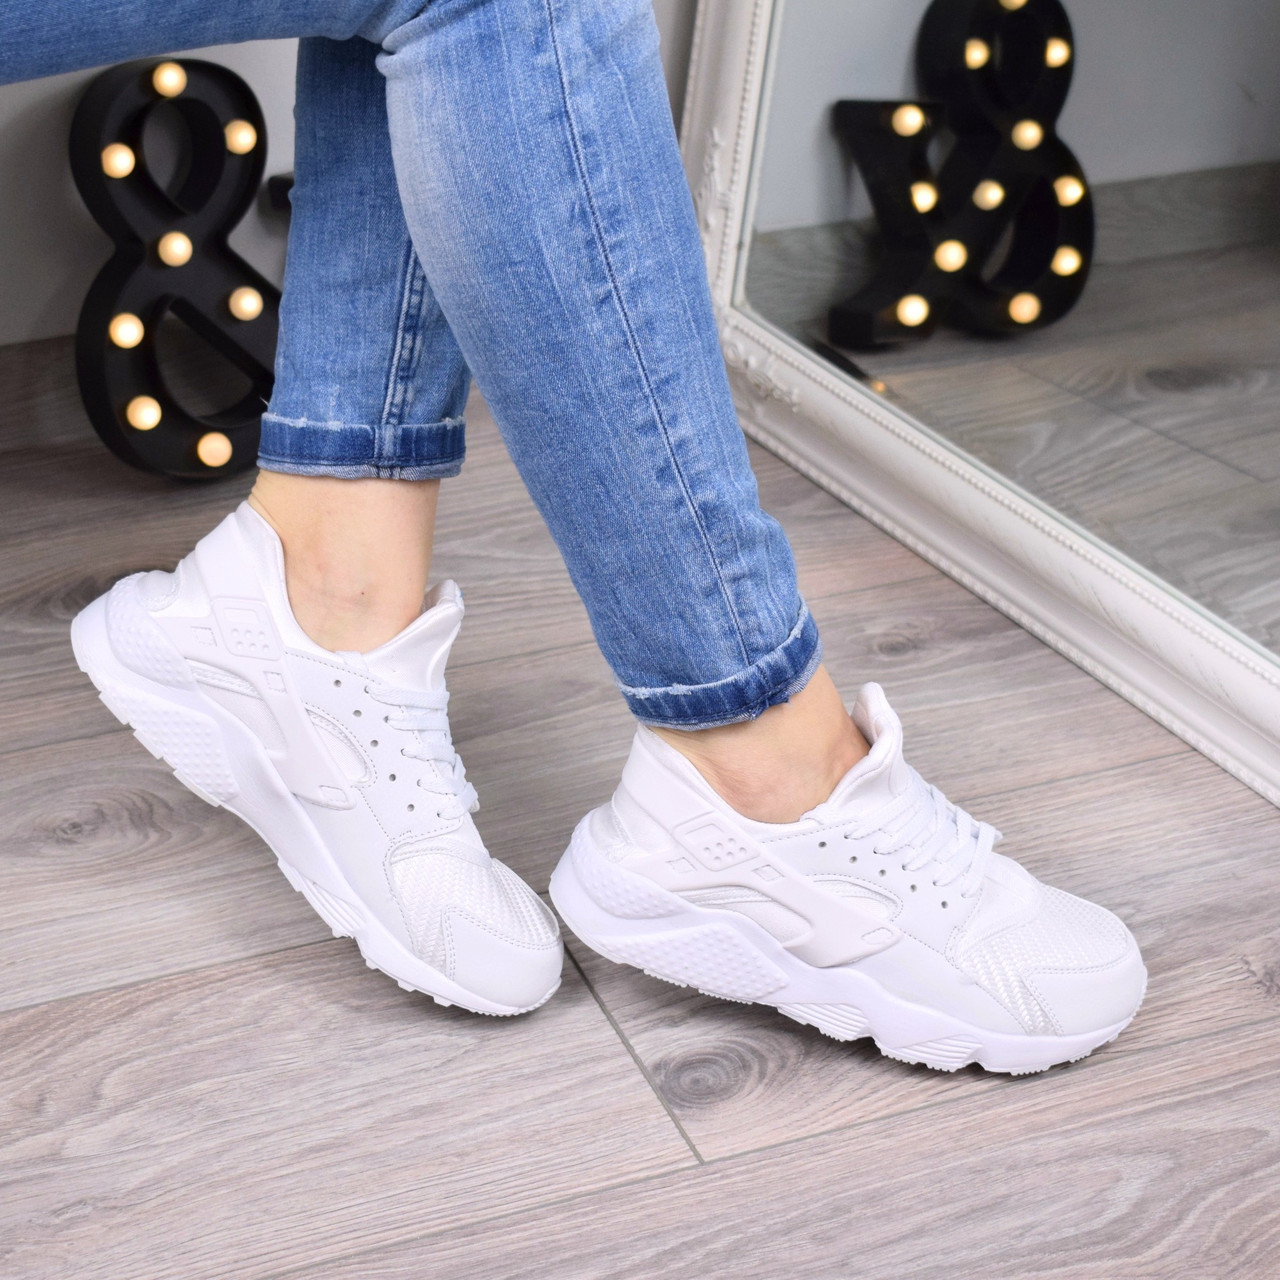 Кроссовки женские Nike Huarache white 3447 41 размер люкс качество